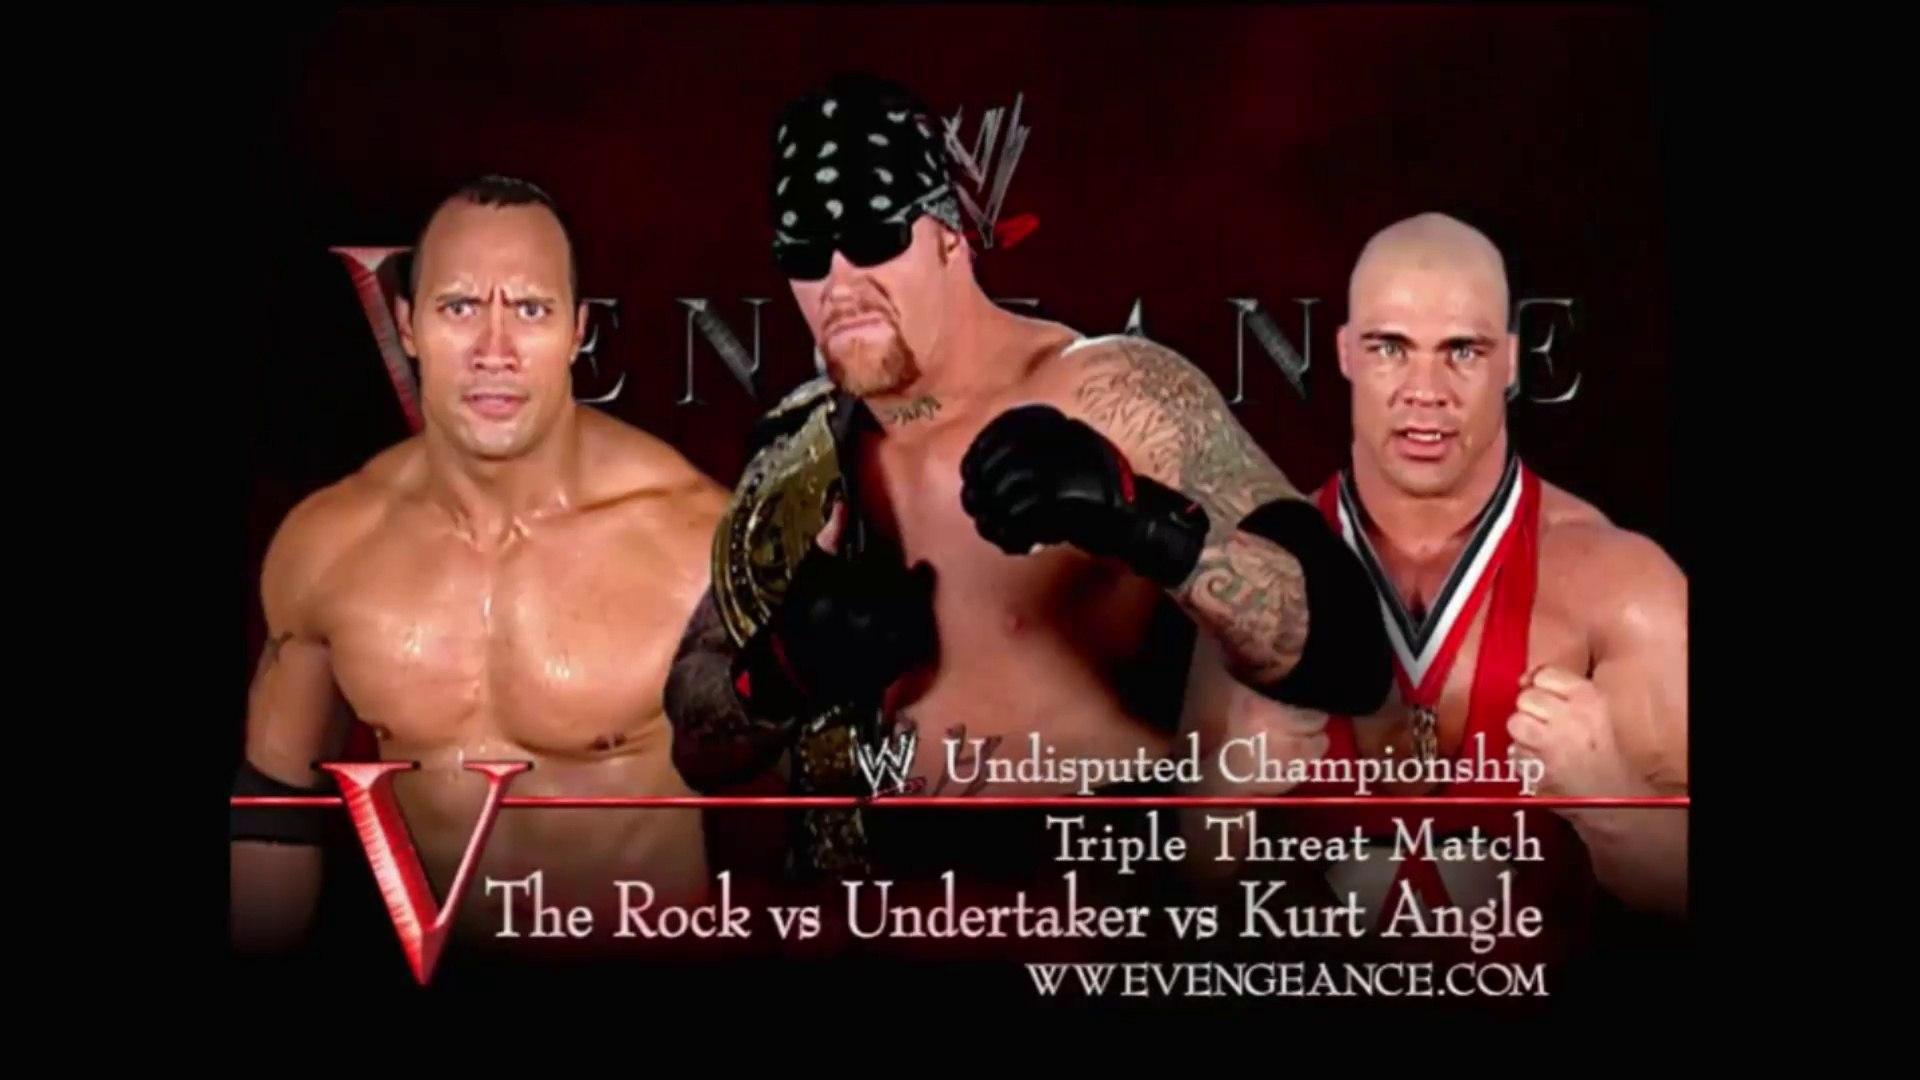 undertaker vs the rock 1920x1080 wallpaper teahub io teahub io